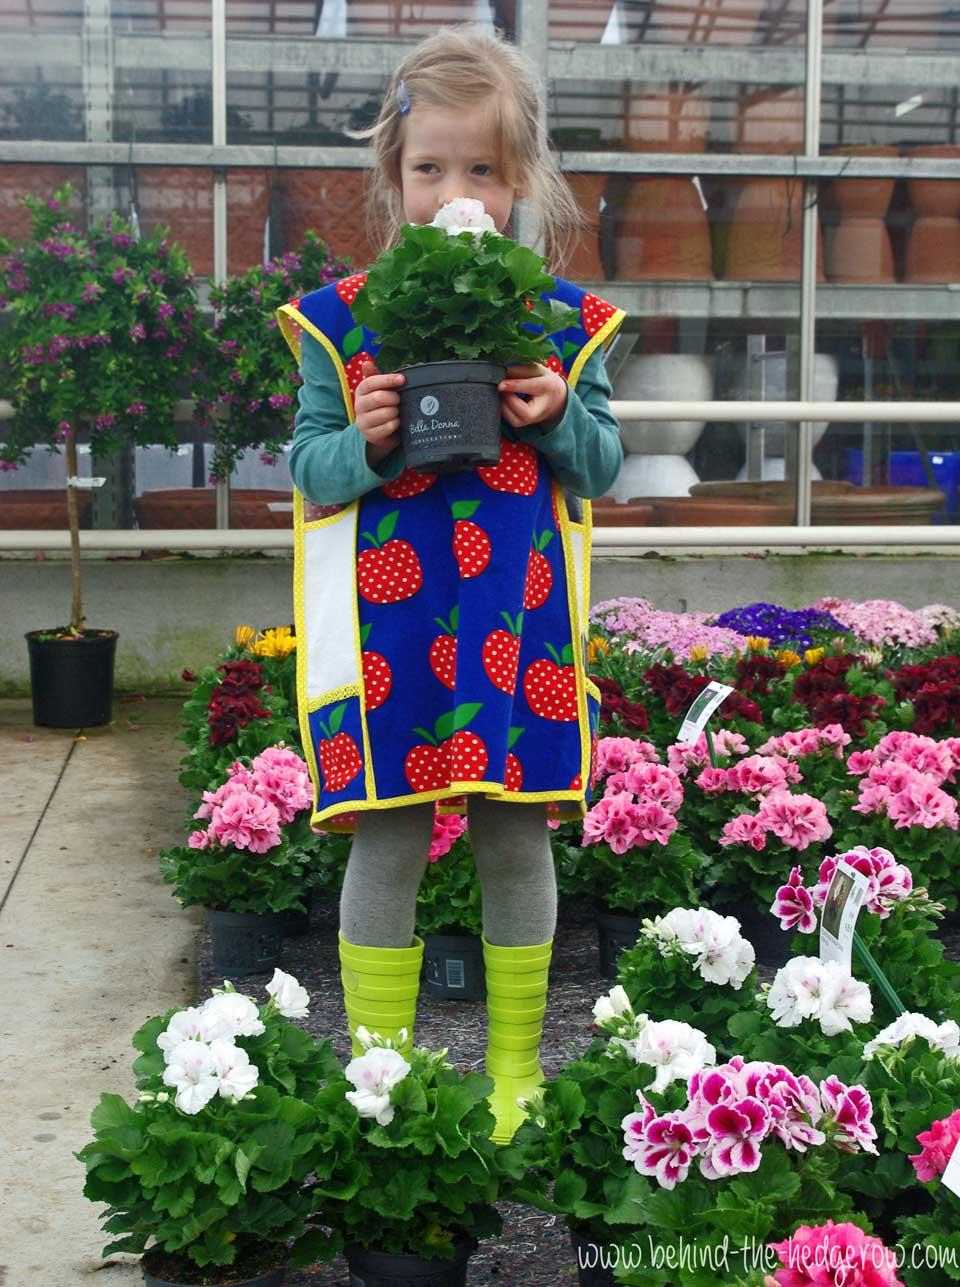 gardening-apron-holding-plant